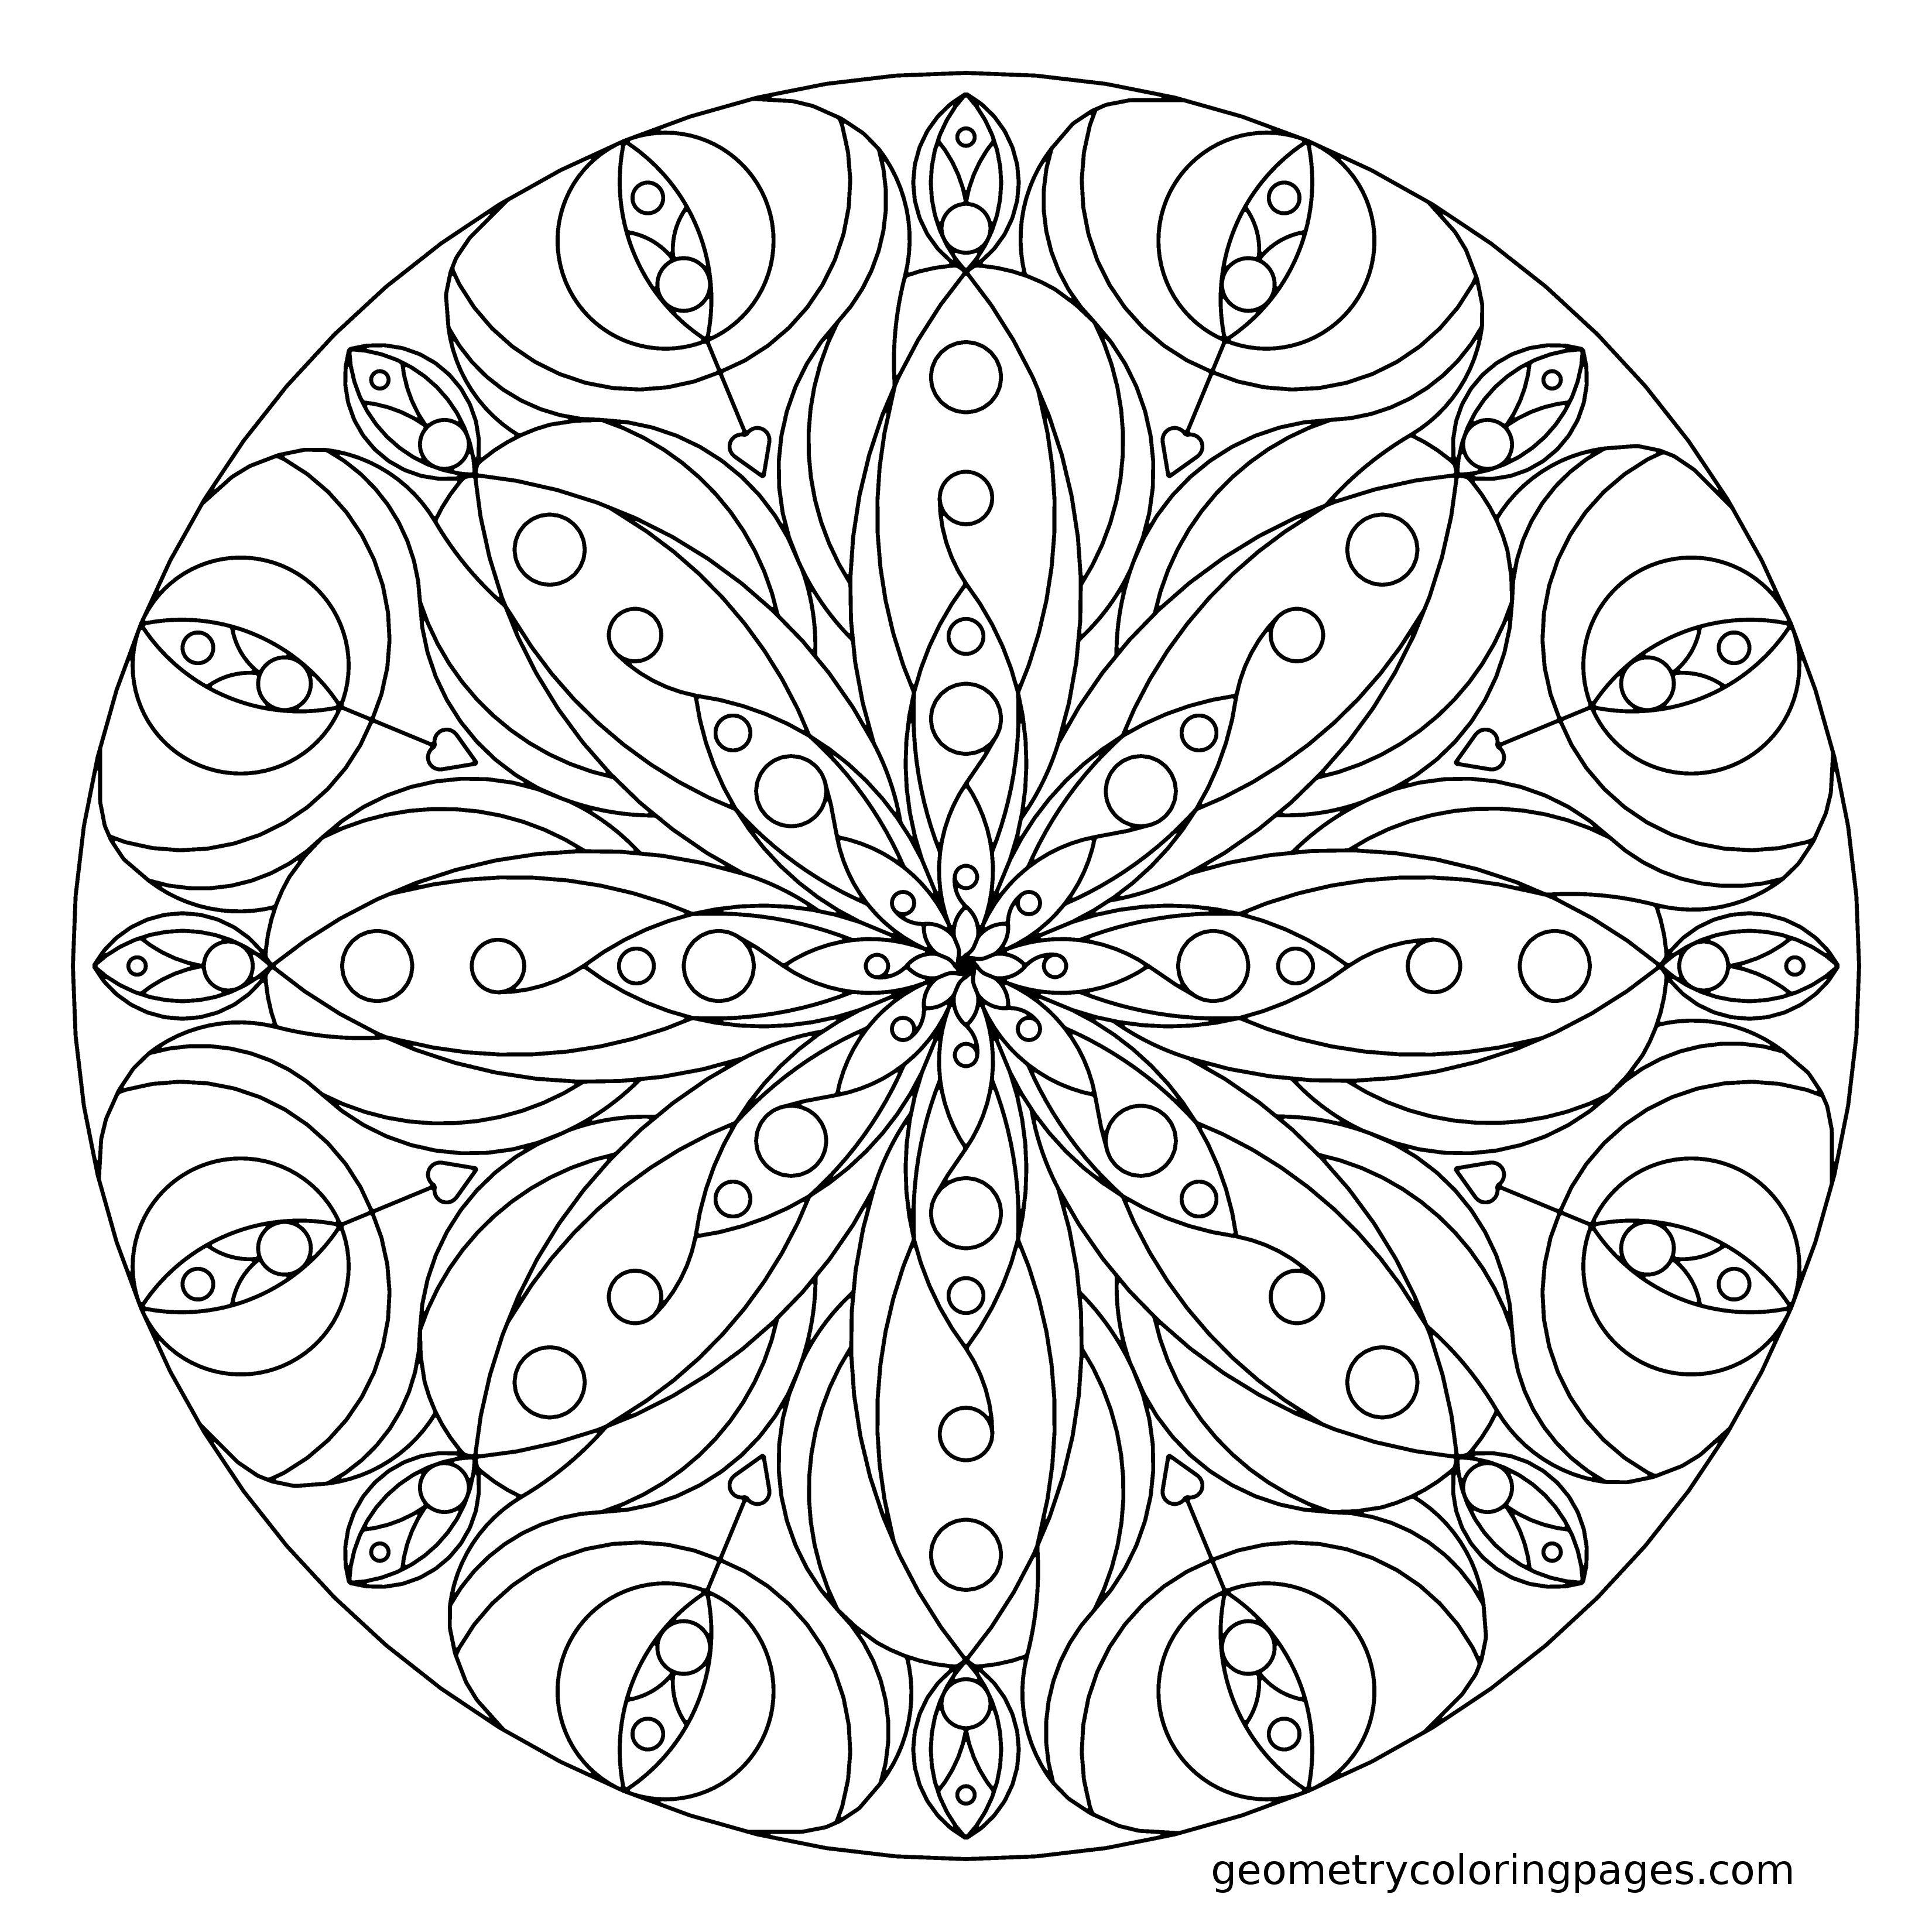 Heart Mandala Coloring Pages Geometry coloring pages | Mandalas ...